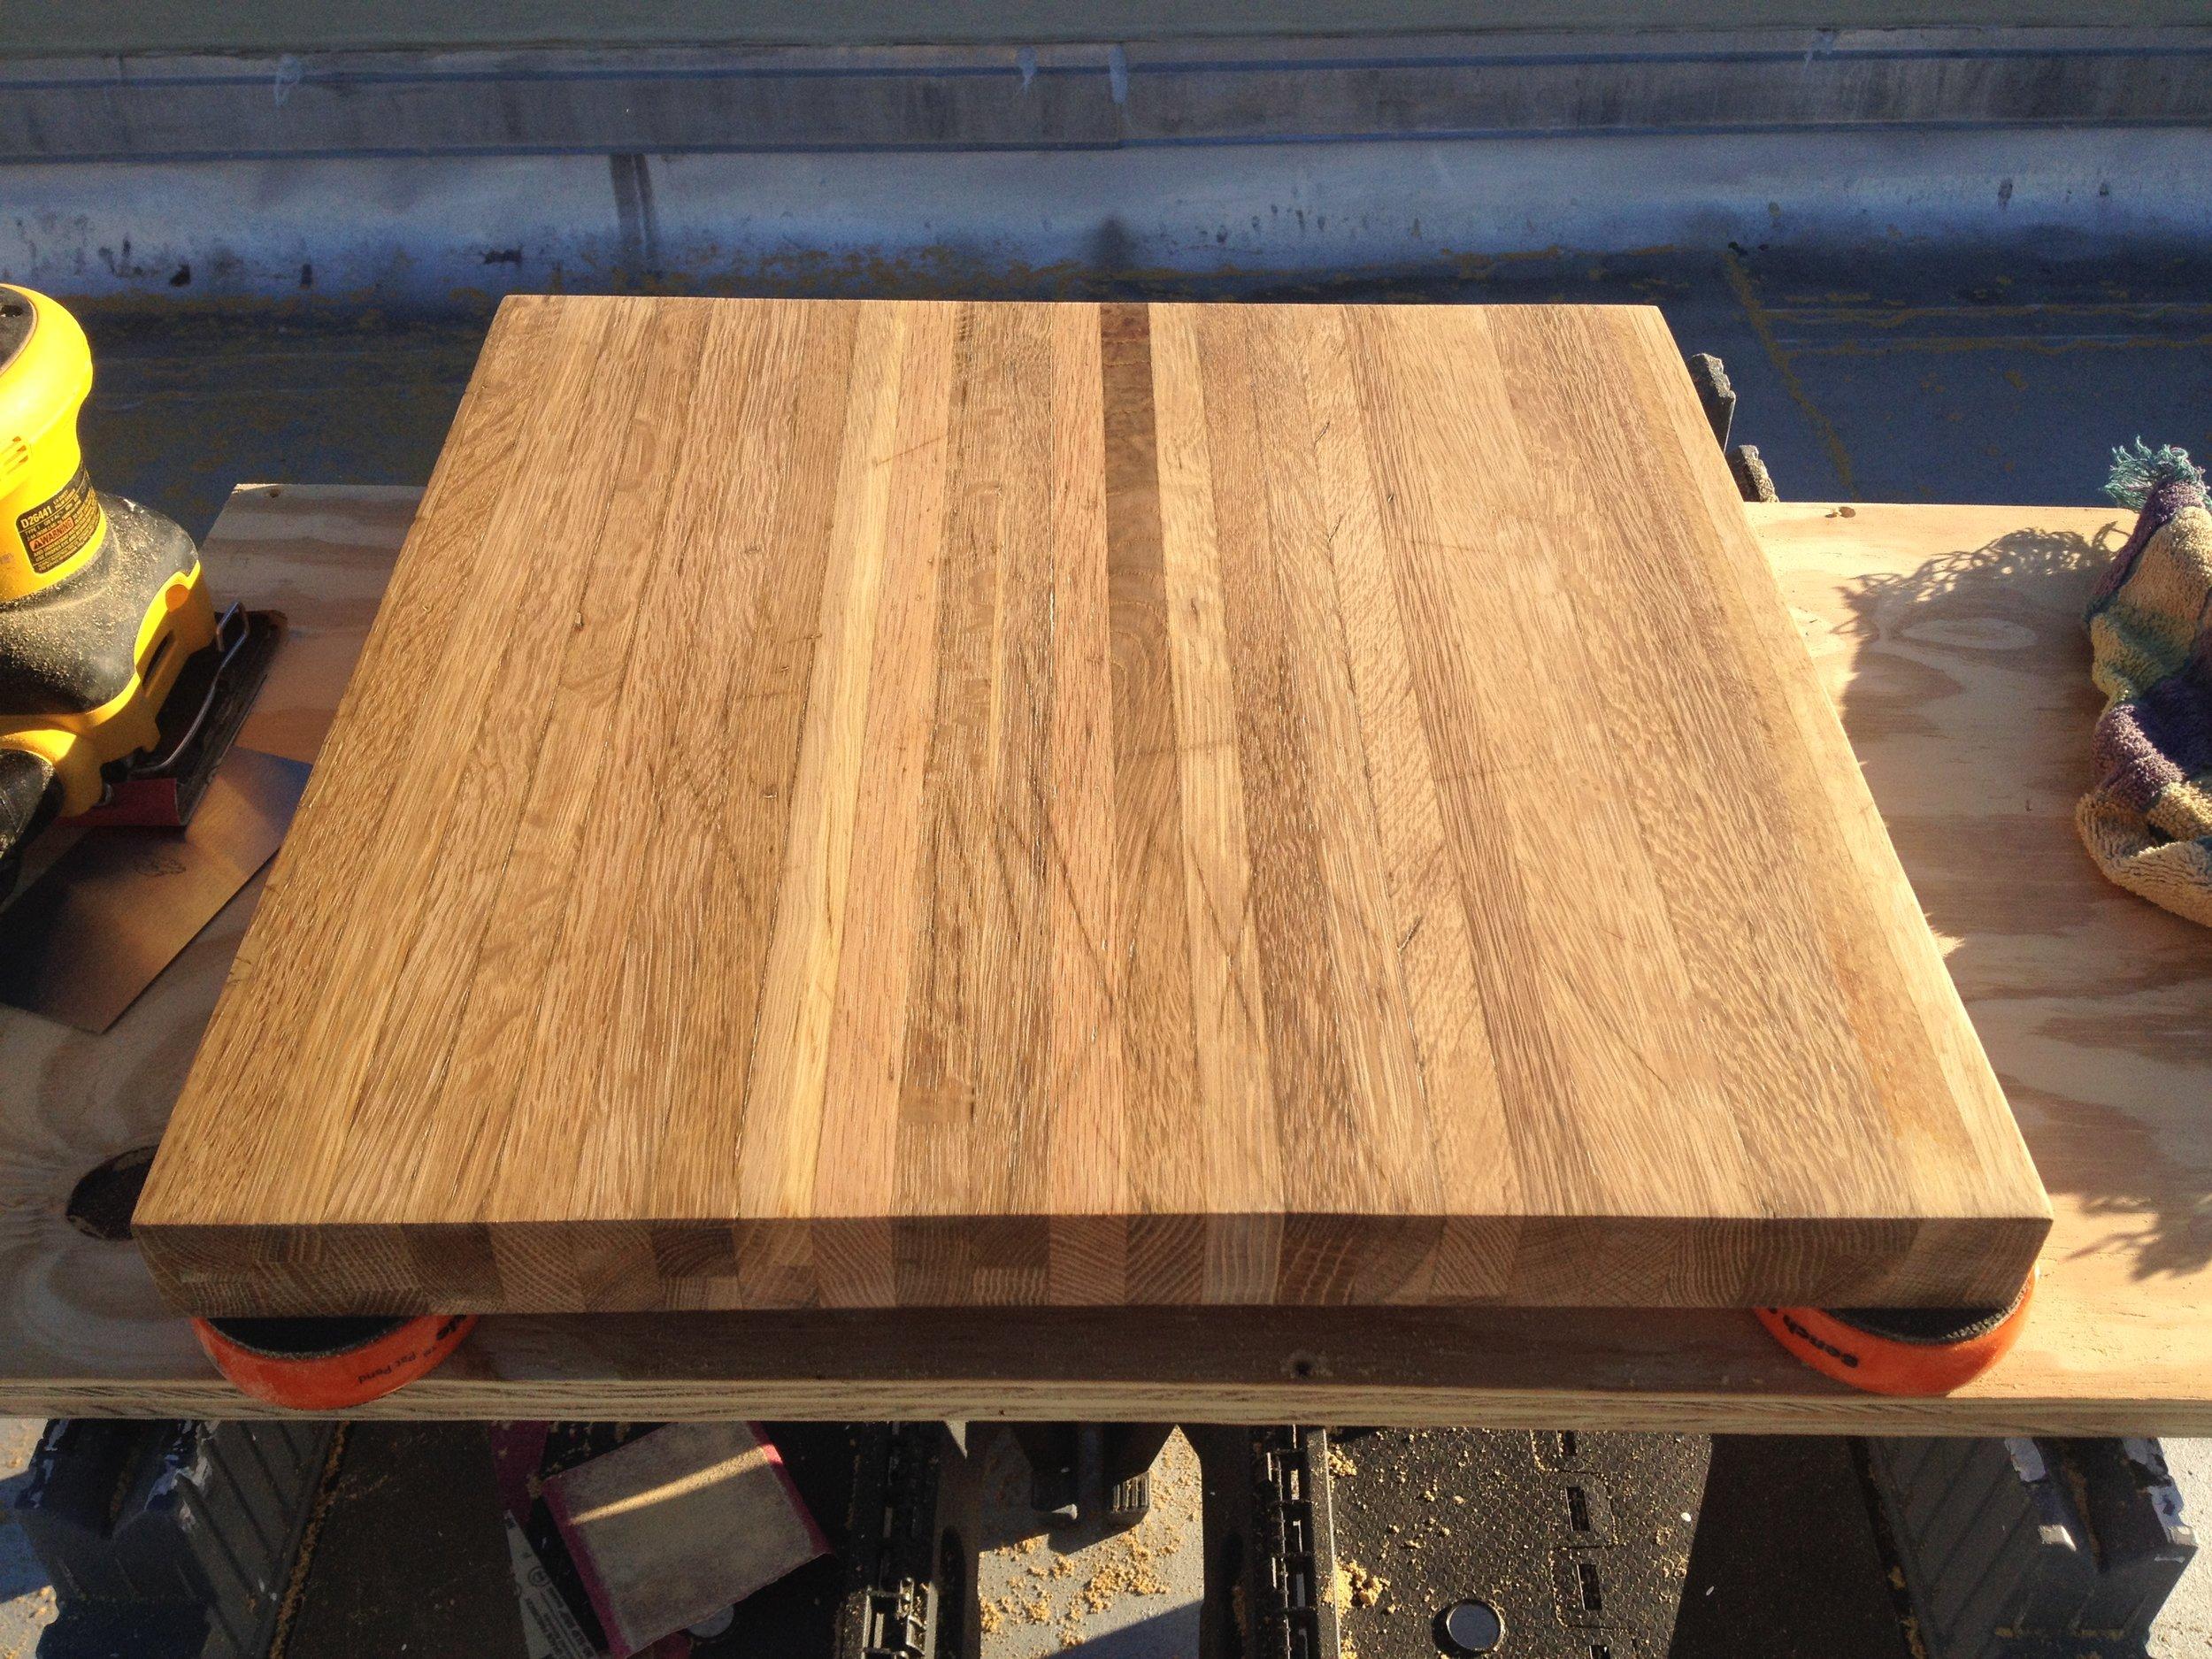 cutting-board-restoration-in-progress-10.jpg